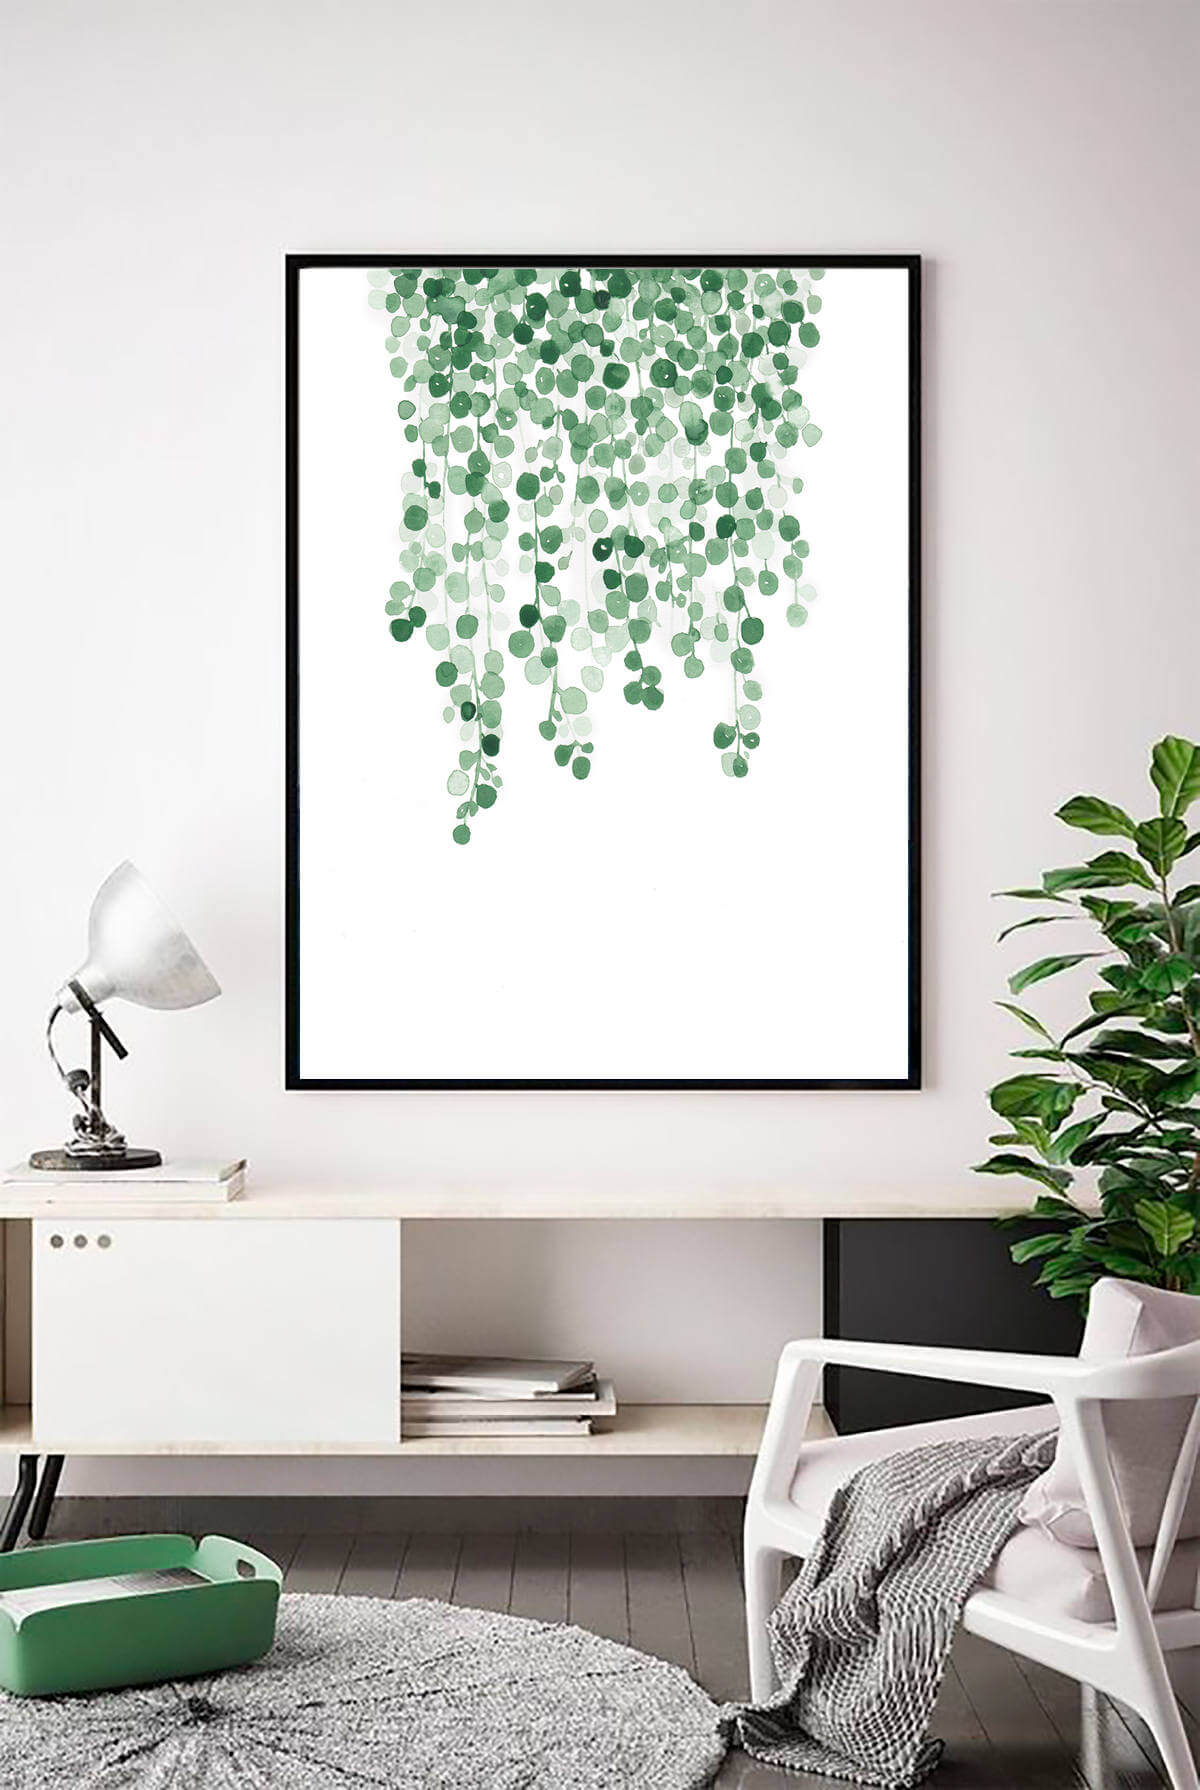 Botanical Art Adds a Pop of Color